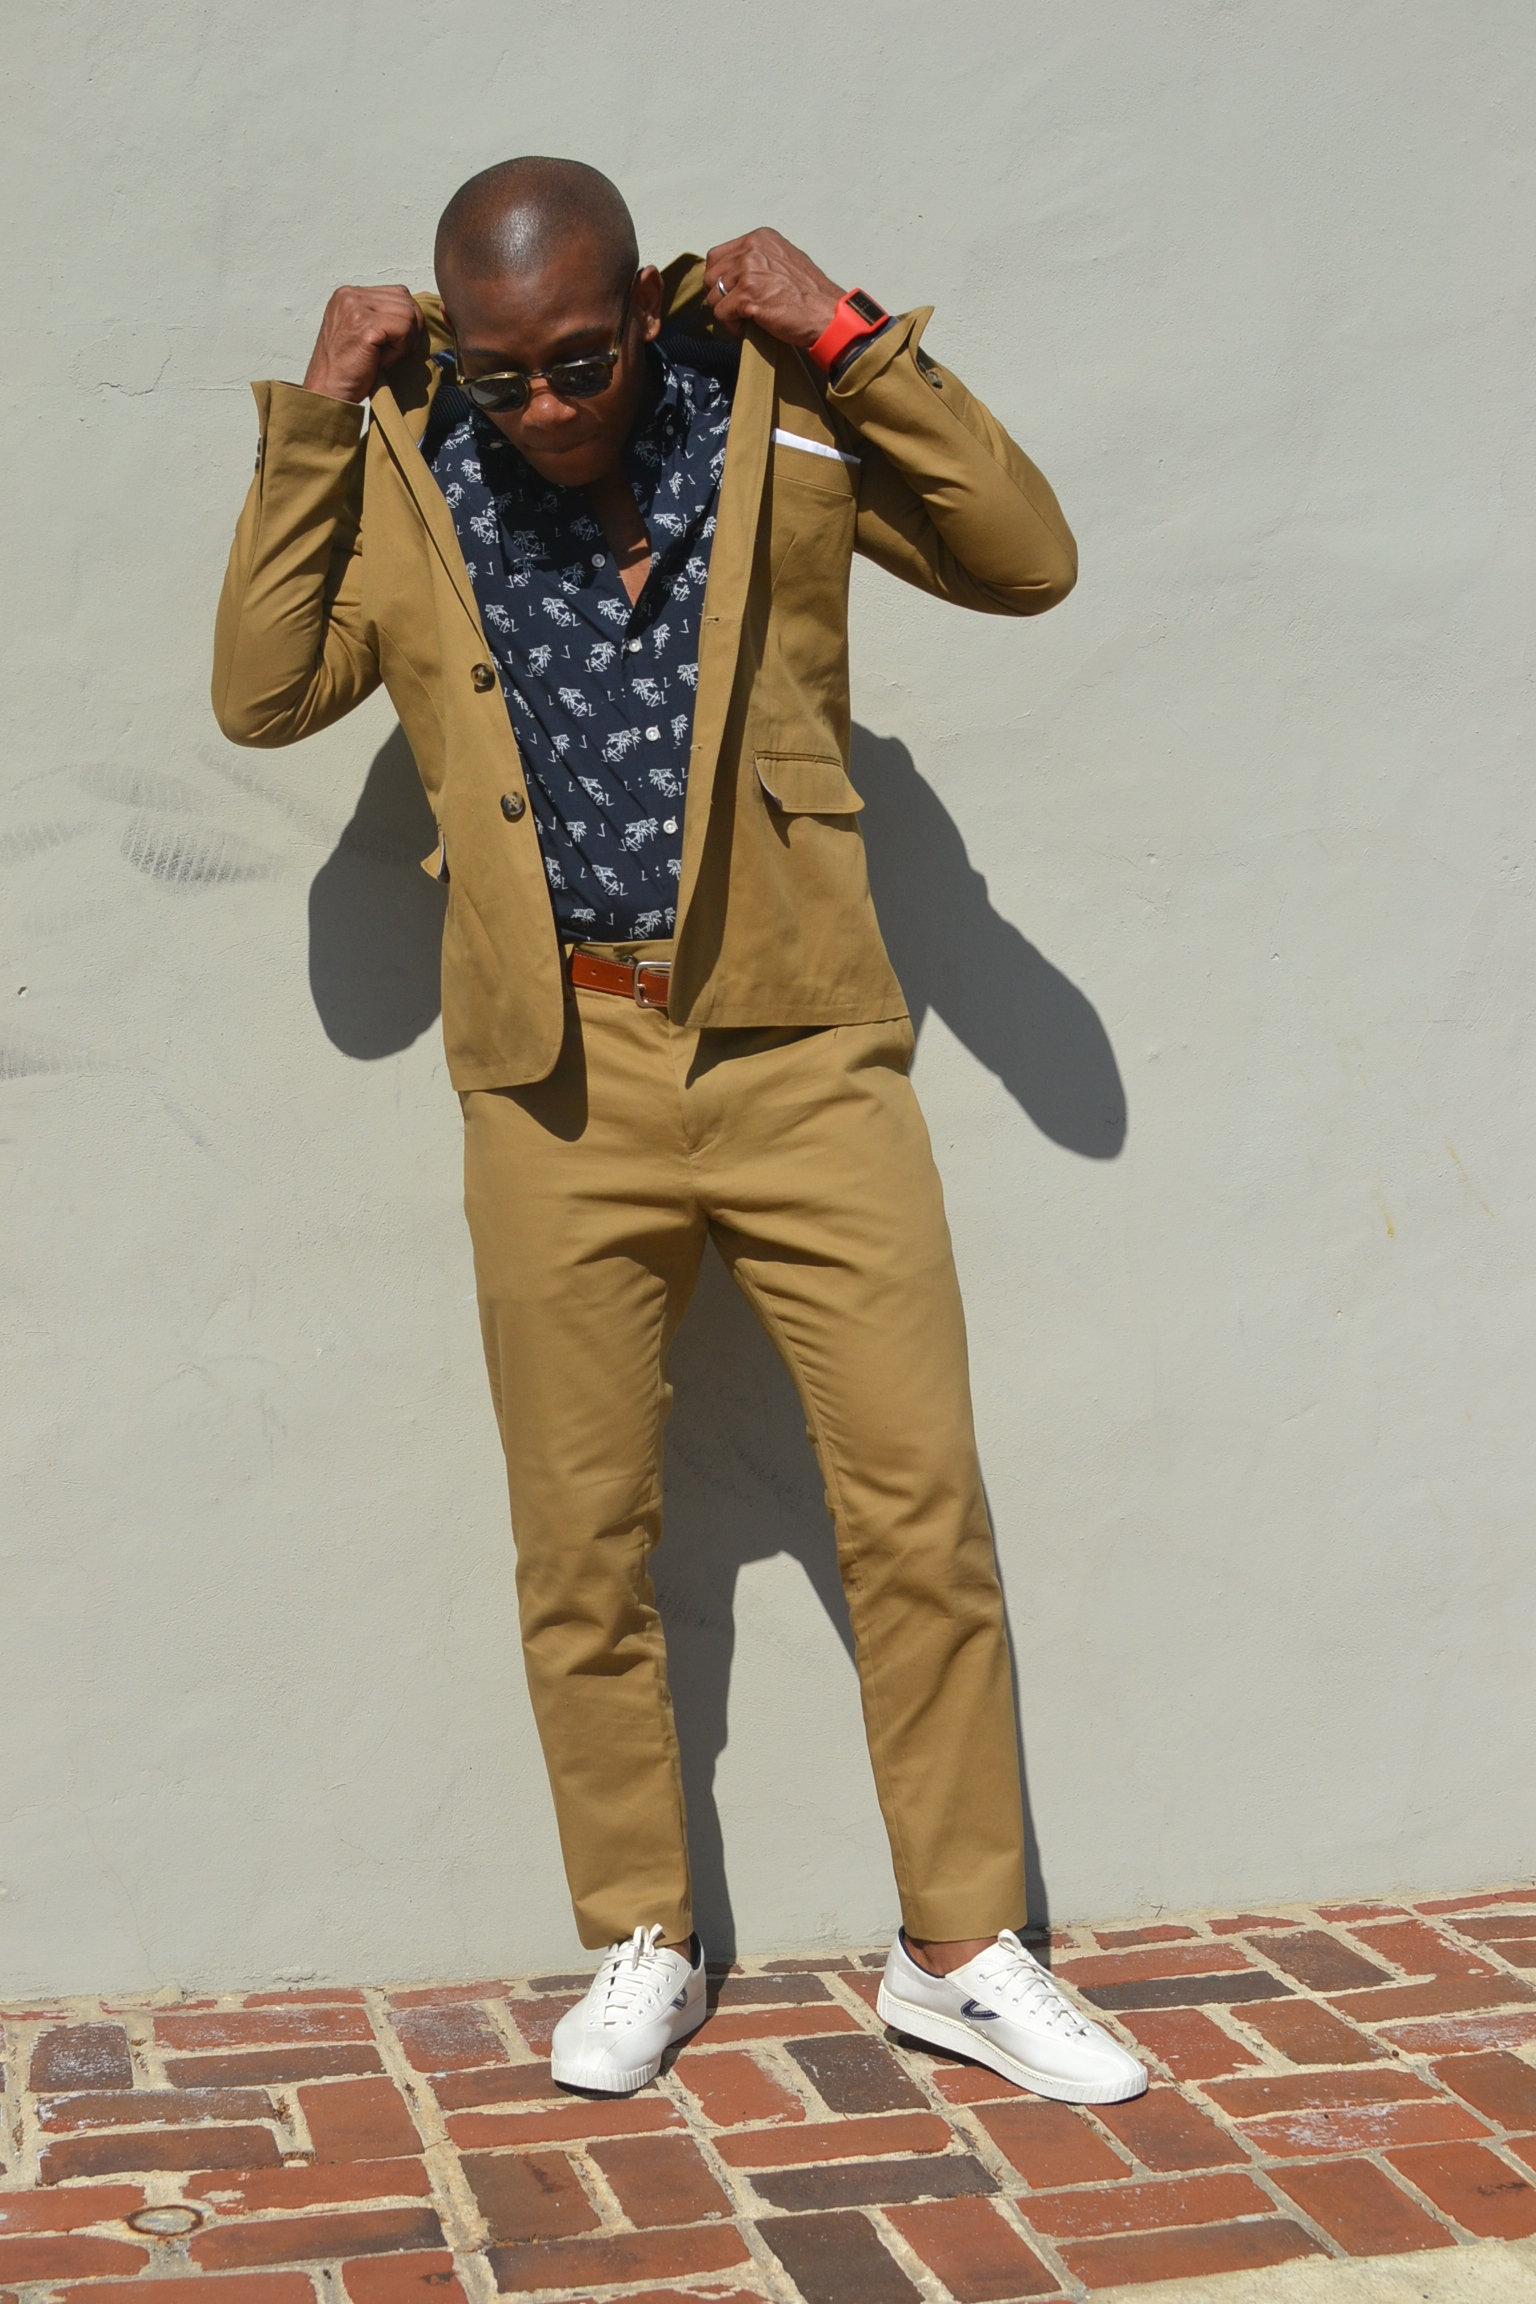 Frank & Oak Khaki Suit on Men's Style Pro